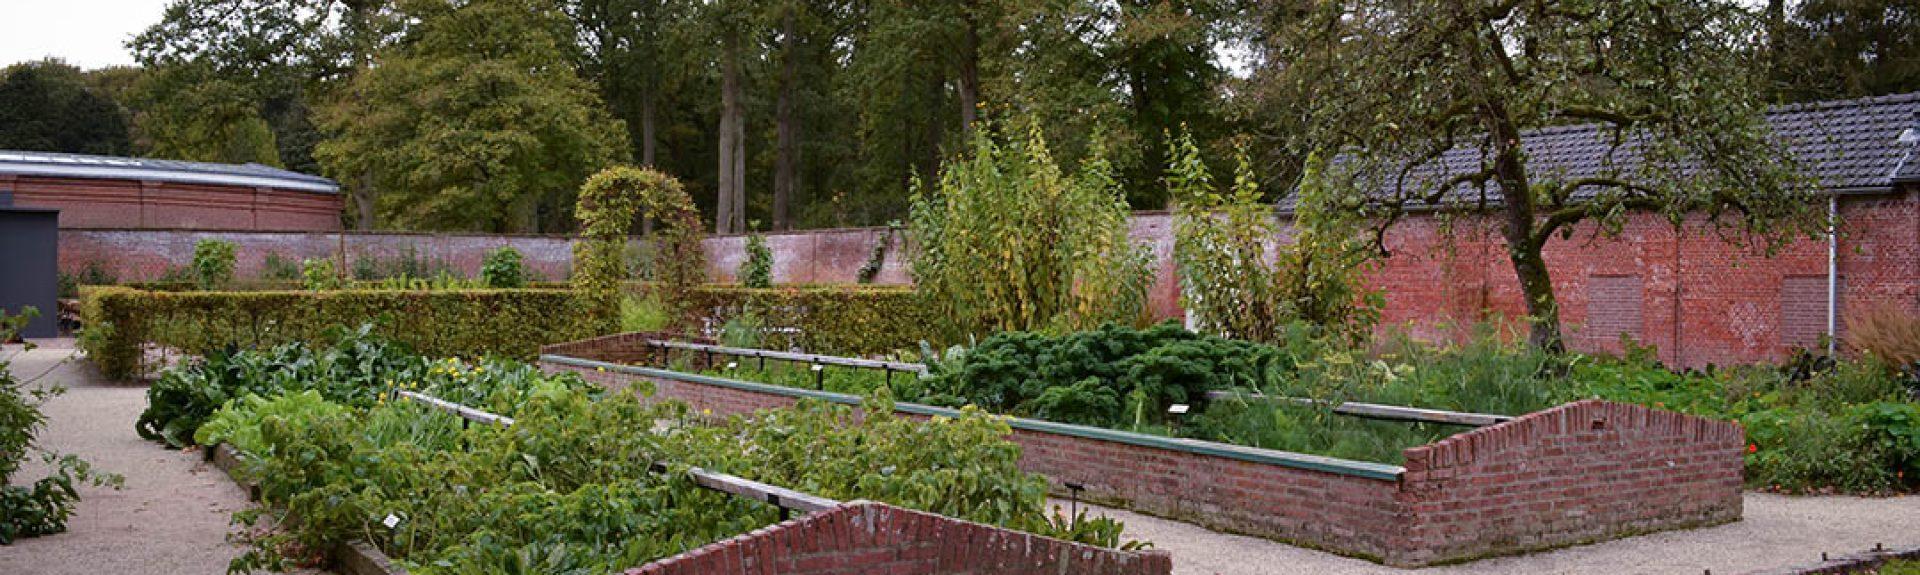 Renovatie Landgoed Mattemburgh - Kruidentuin